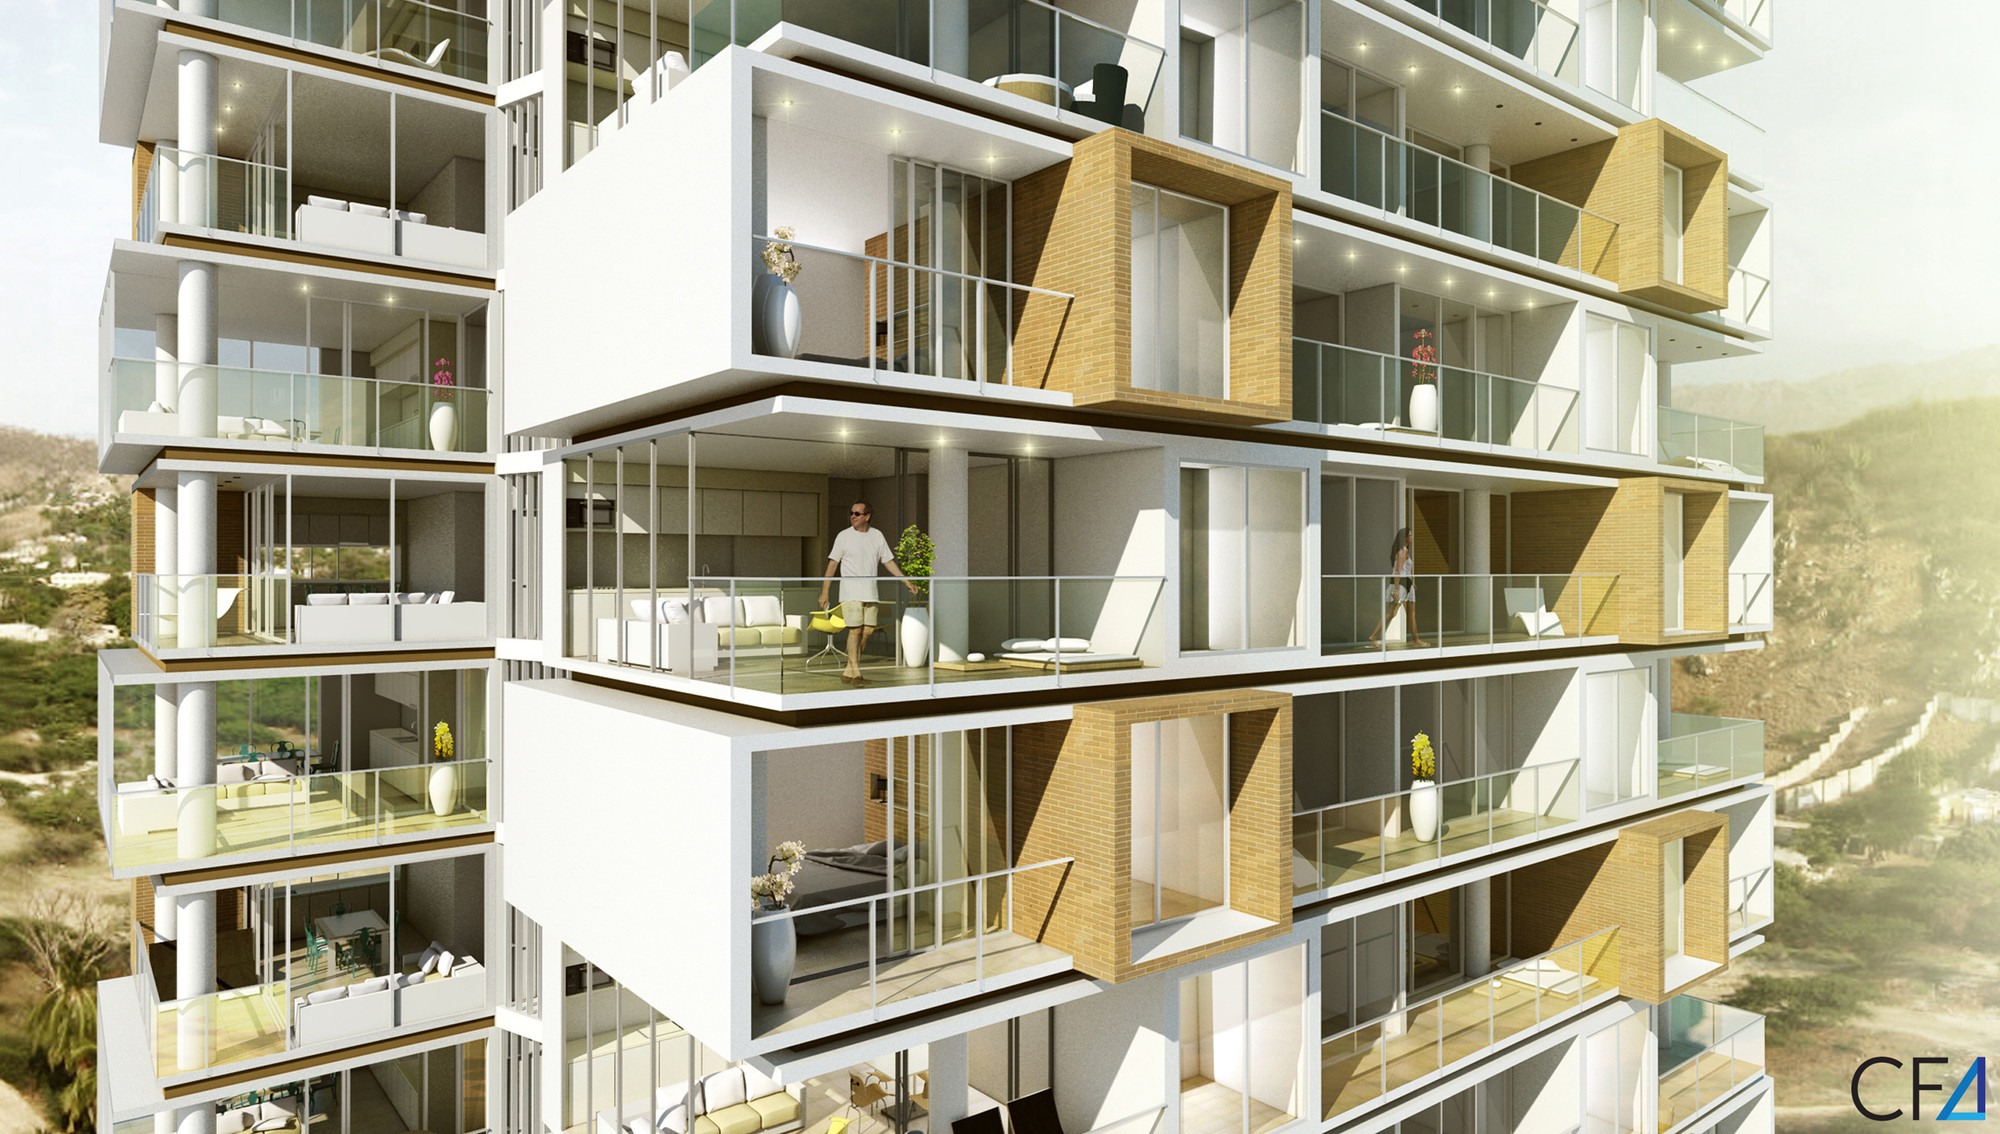 Primer Lugar Proyecto Puerto Salguero /  LGN Arquitectos + Contrafuerte Arquitectura, Cortesia de LGN Arquitectos + ContraFuerte Arquitectura